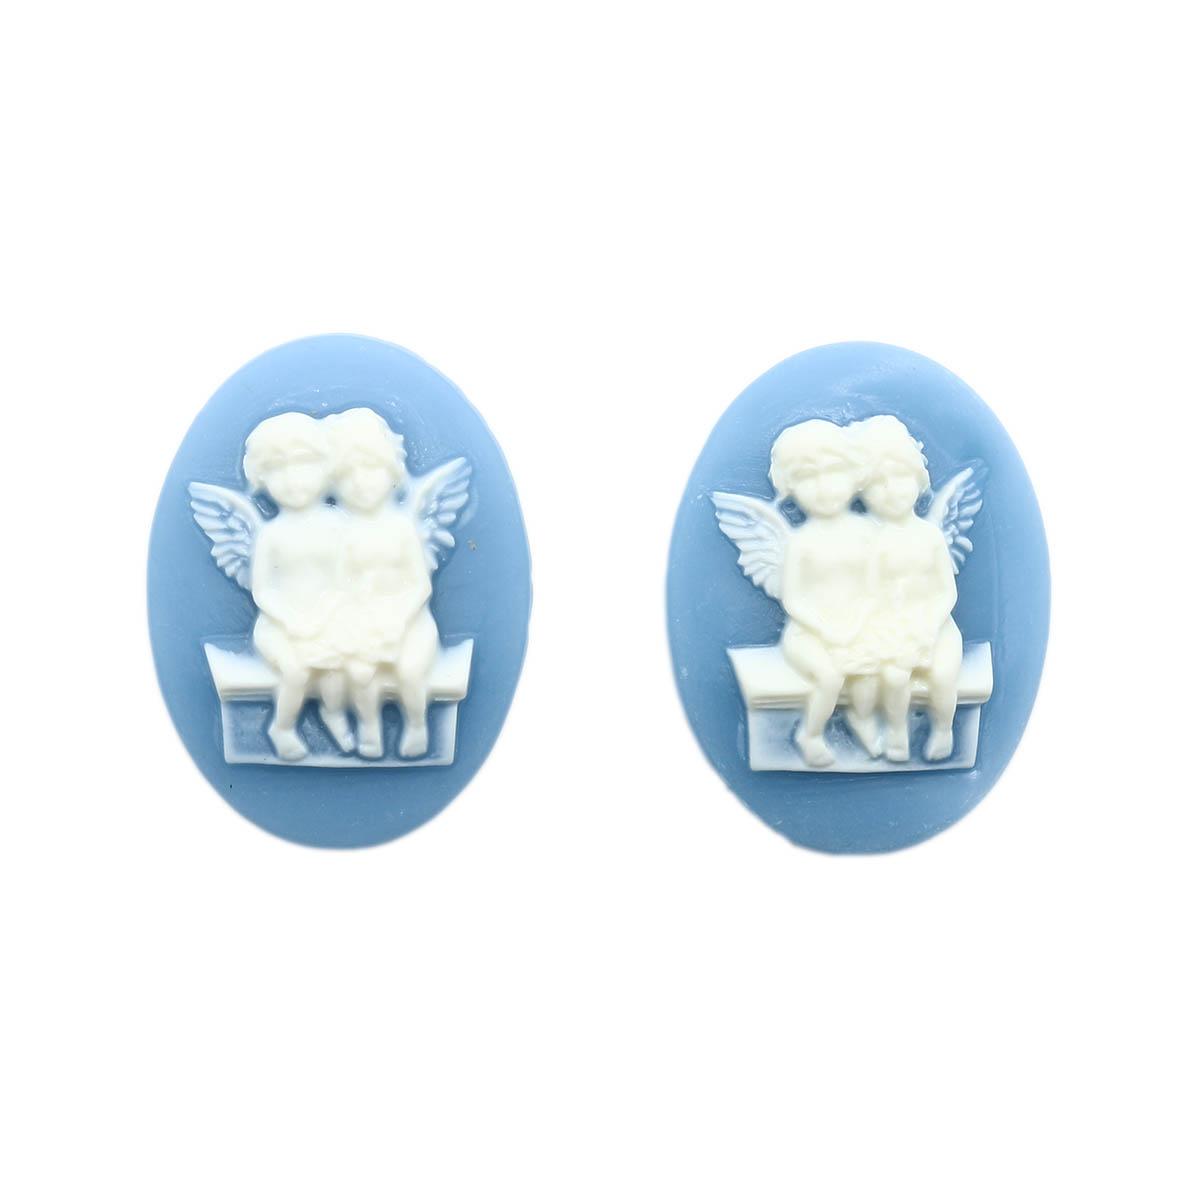 ARS0227 Камеи 'Ангелы', (полимер), бело-голубой, 3*4*0,5 см, упак./2 шт., Vintage Line